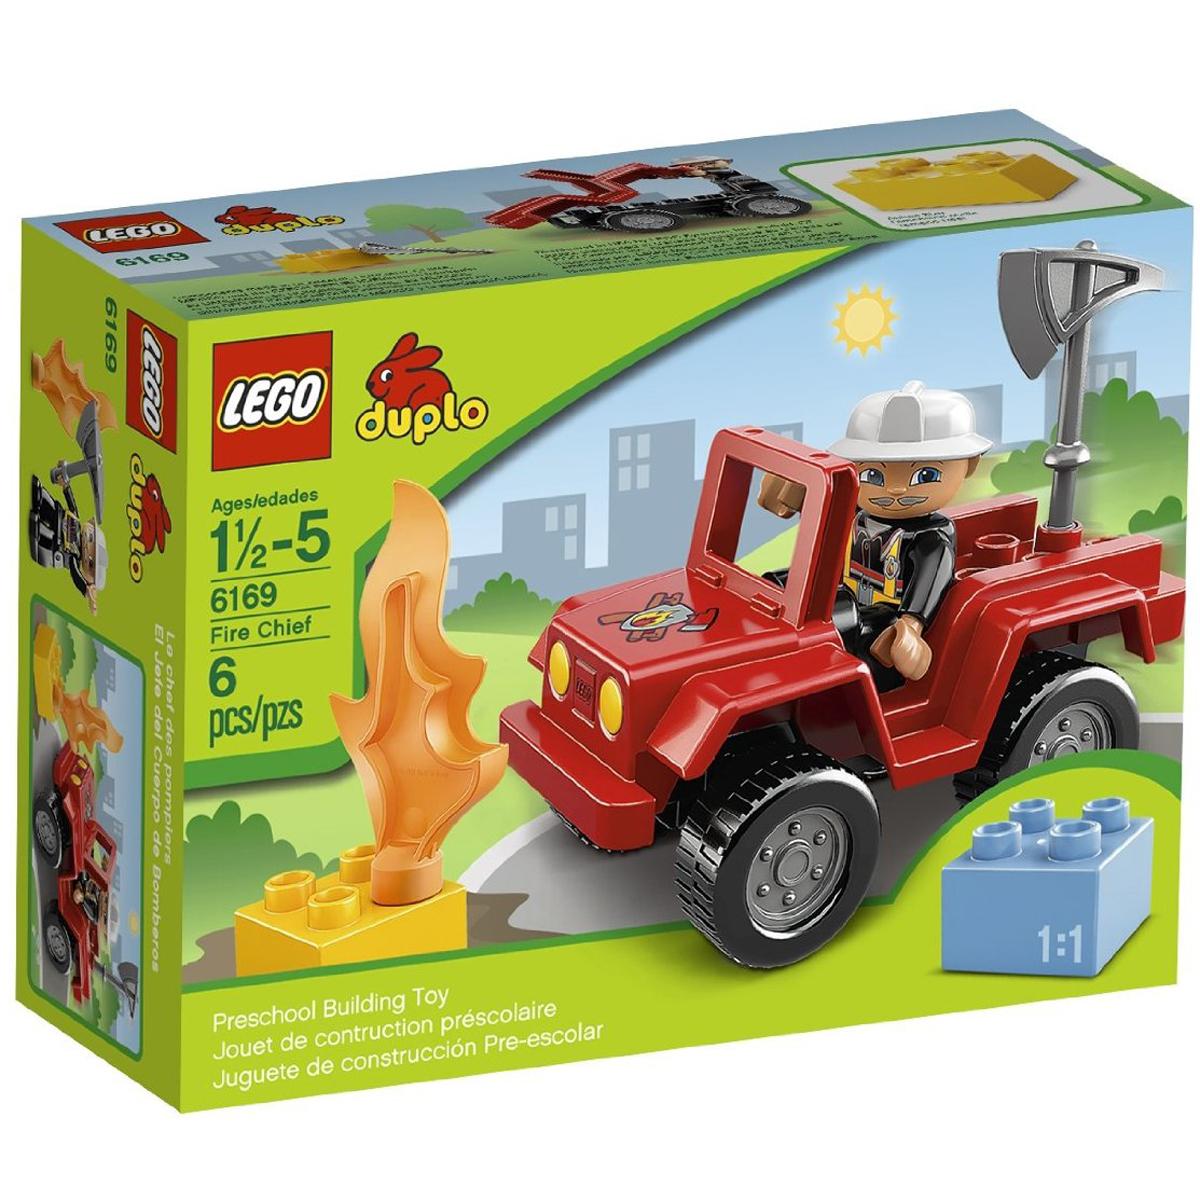 do-choi-xep-hinh-lego-6169